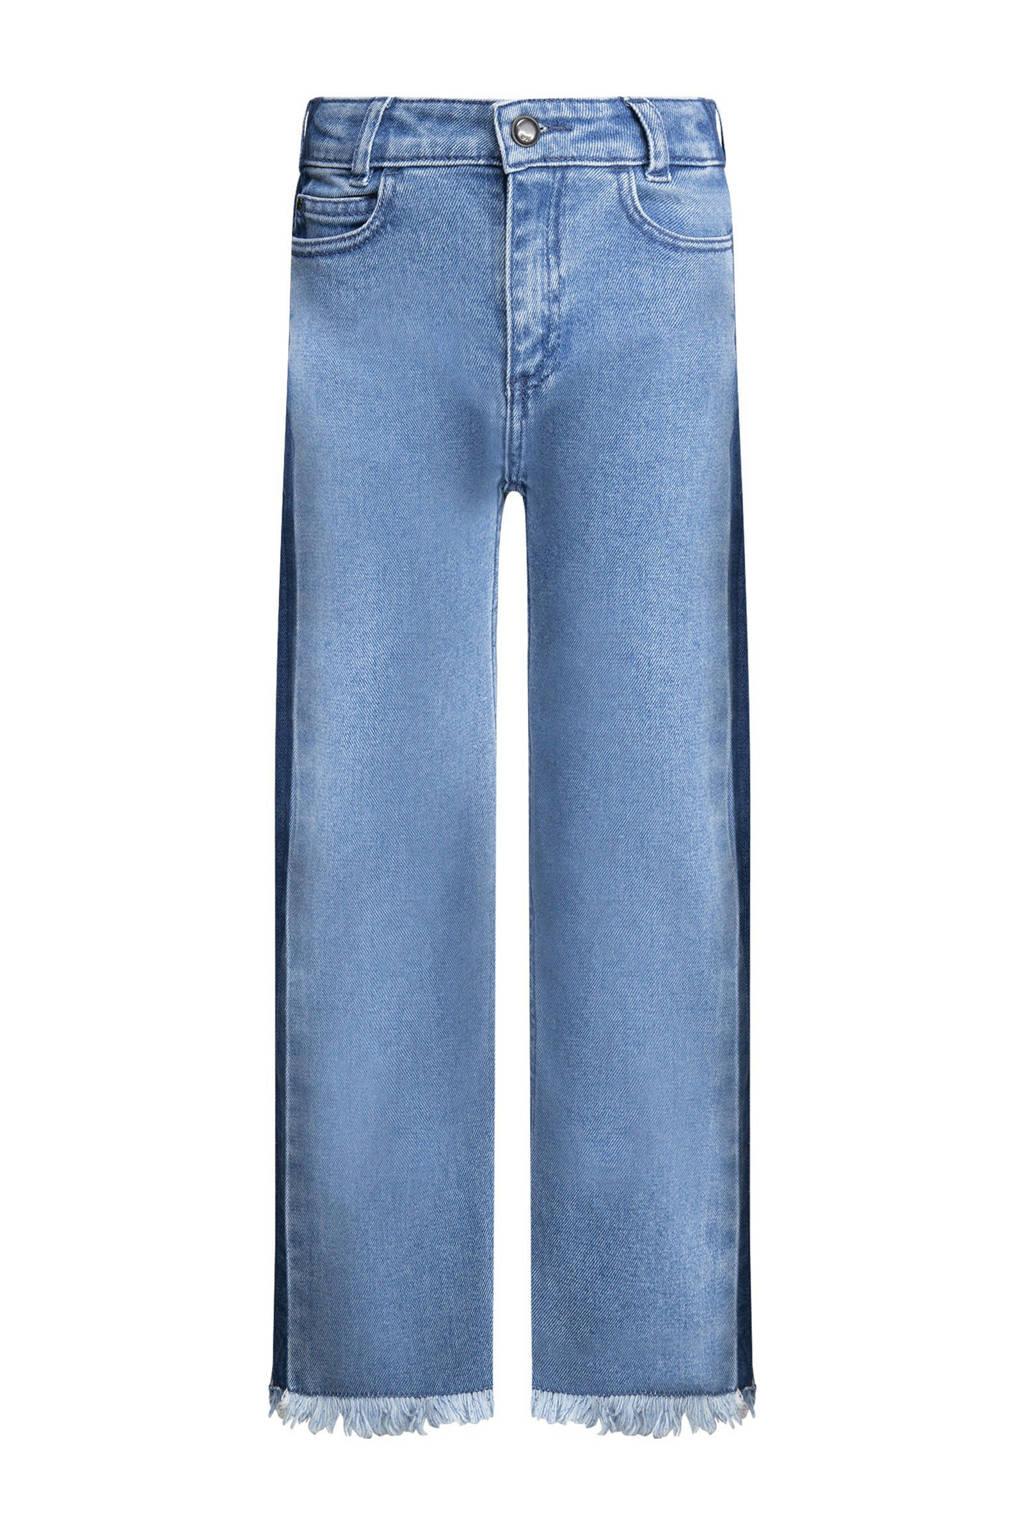 CKS KIDS cropped high waist loose fit jeans Ziula met zijstreep light denim, Light denim